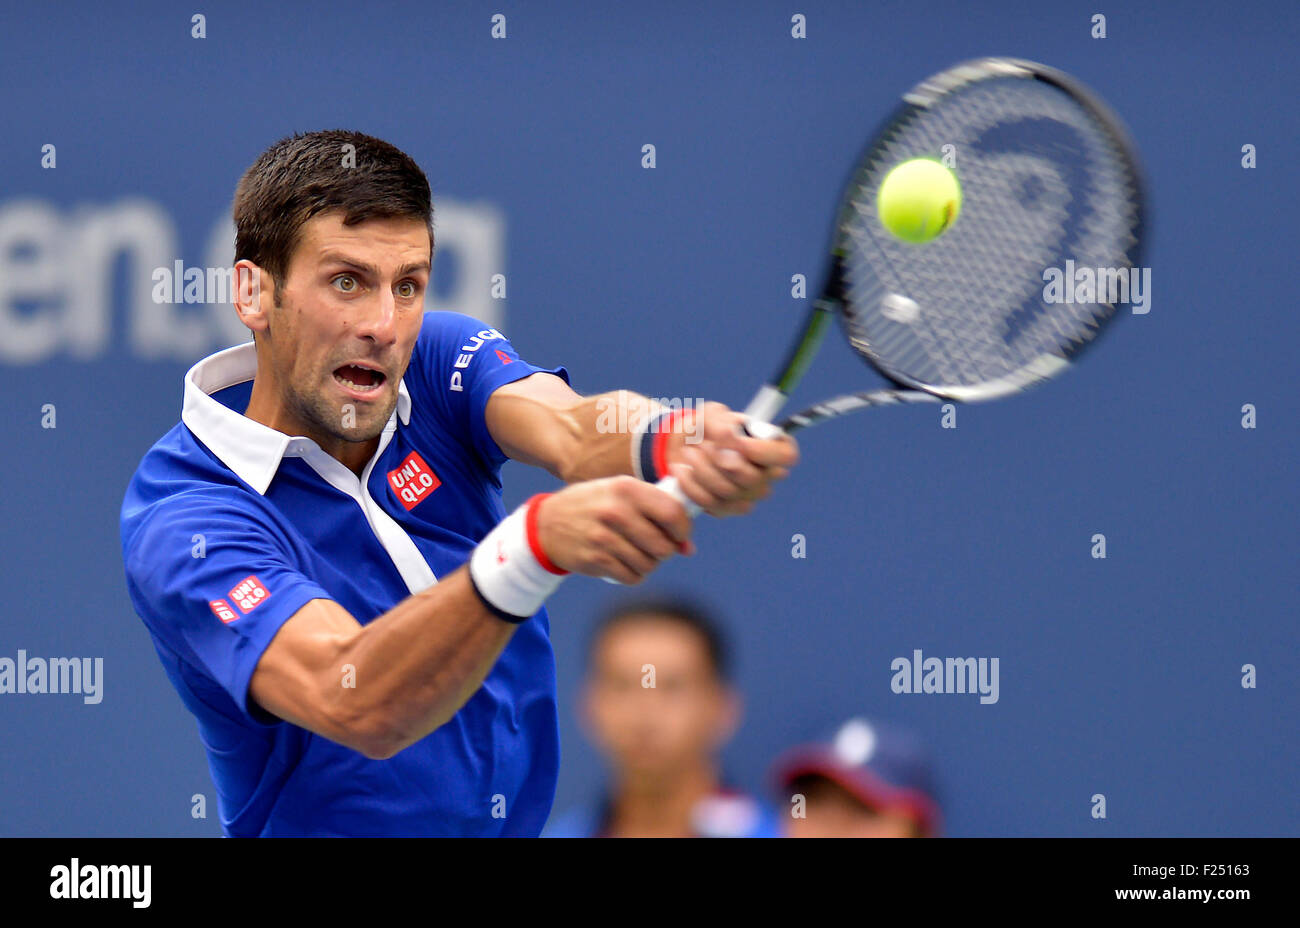 Nueva York, Estados Unidos. 11 Sep, 2015. Novak Djokovic de Serbia devuelve un tiro a Marin Cilic de Croacia durante Imagen De Stock